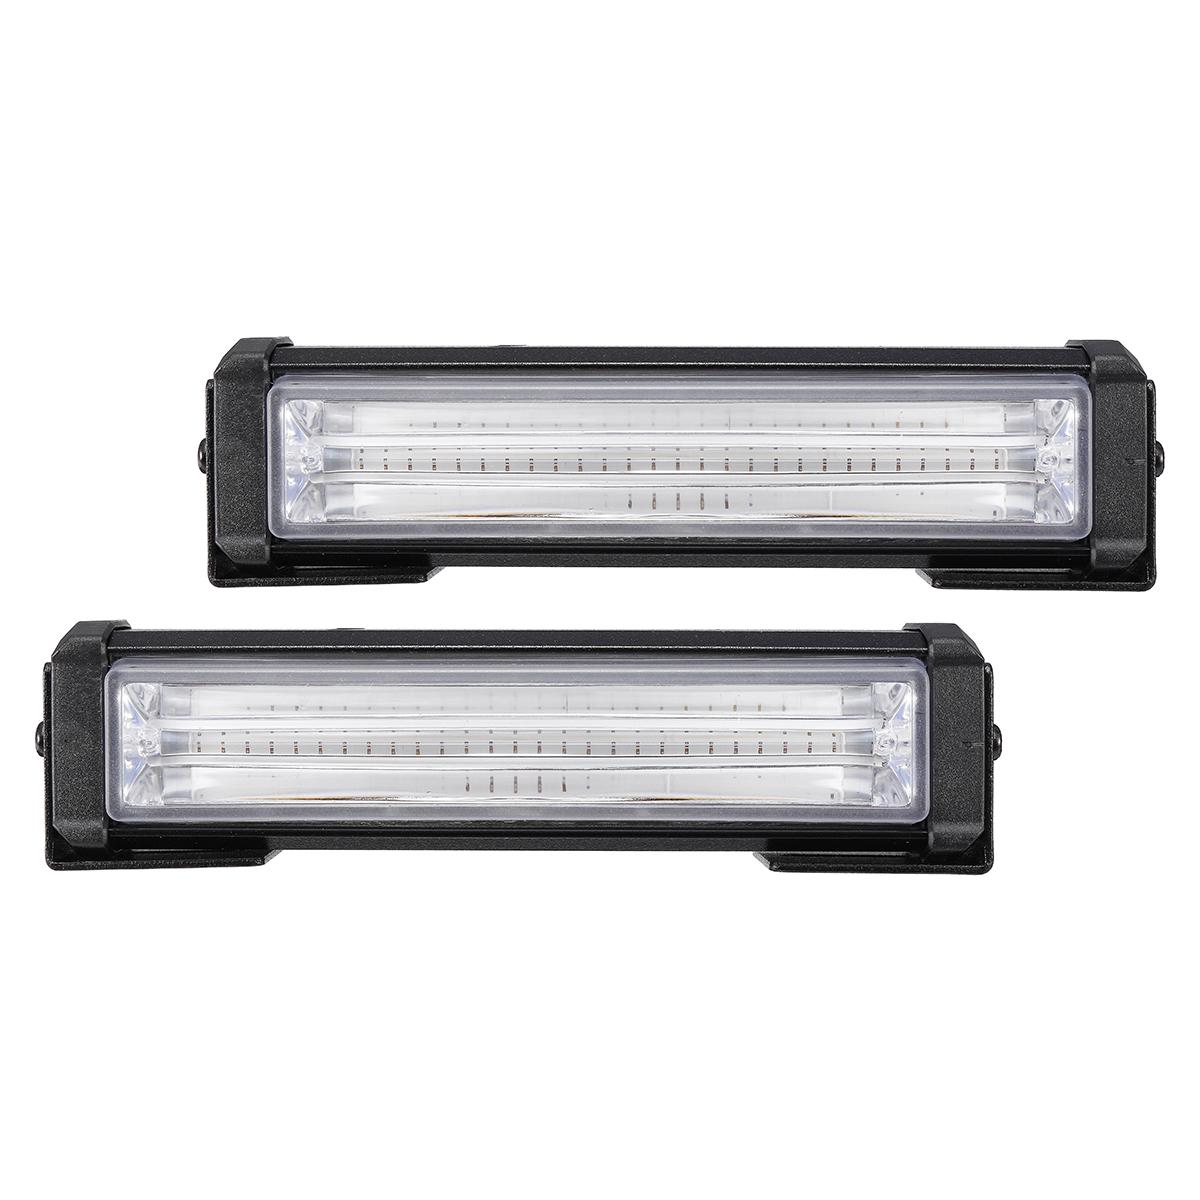 2Pcs 40W Front Grille COB LED Emergency Light Flashing Warning Strobe Lamp 12-24V